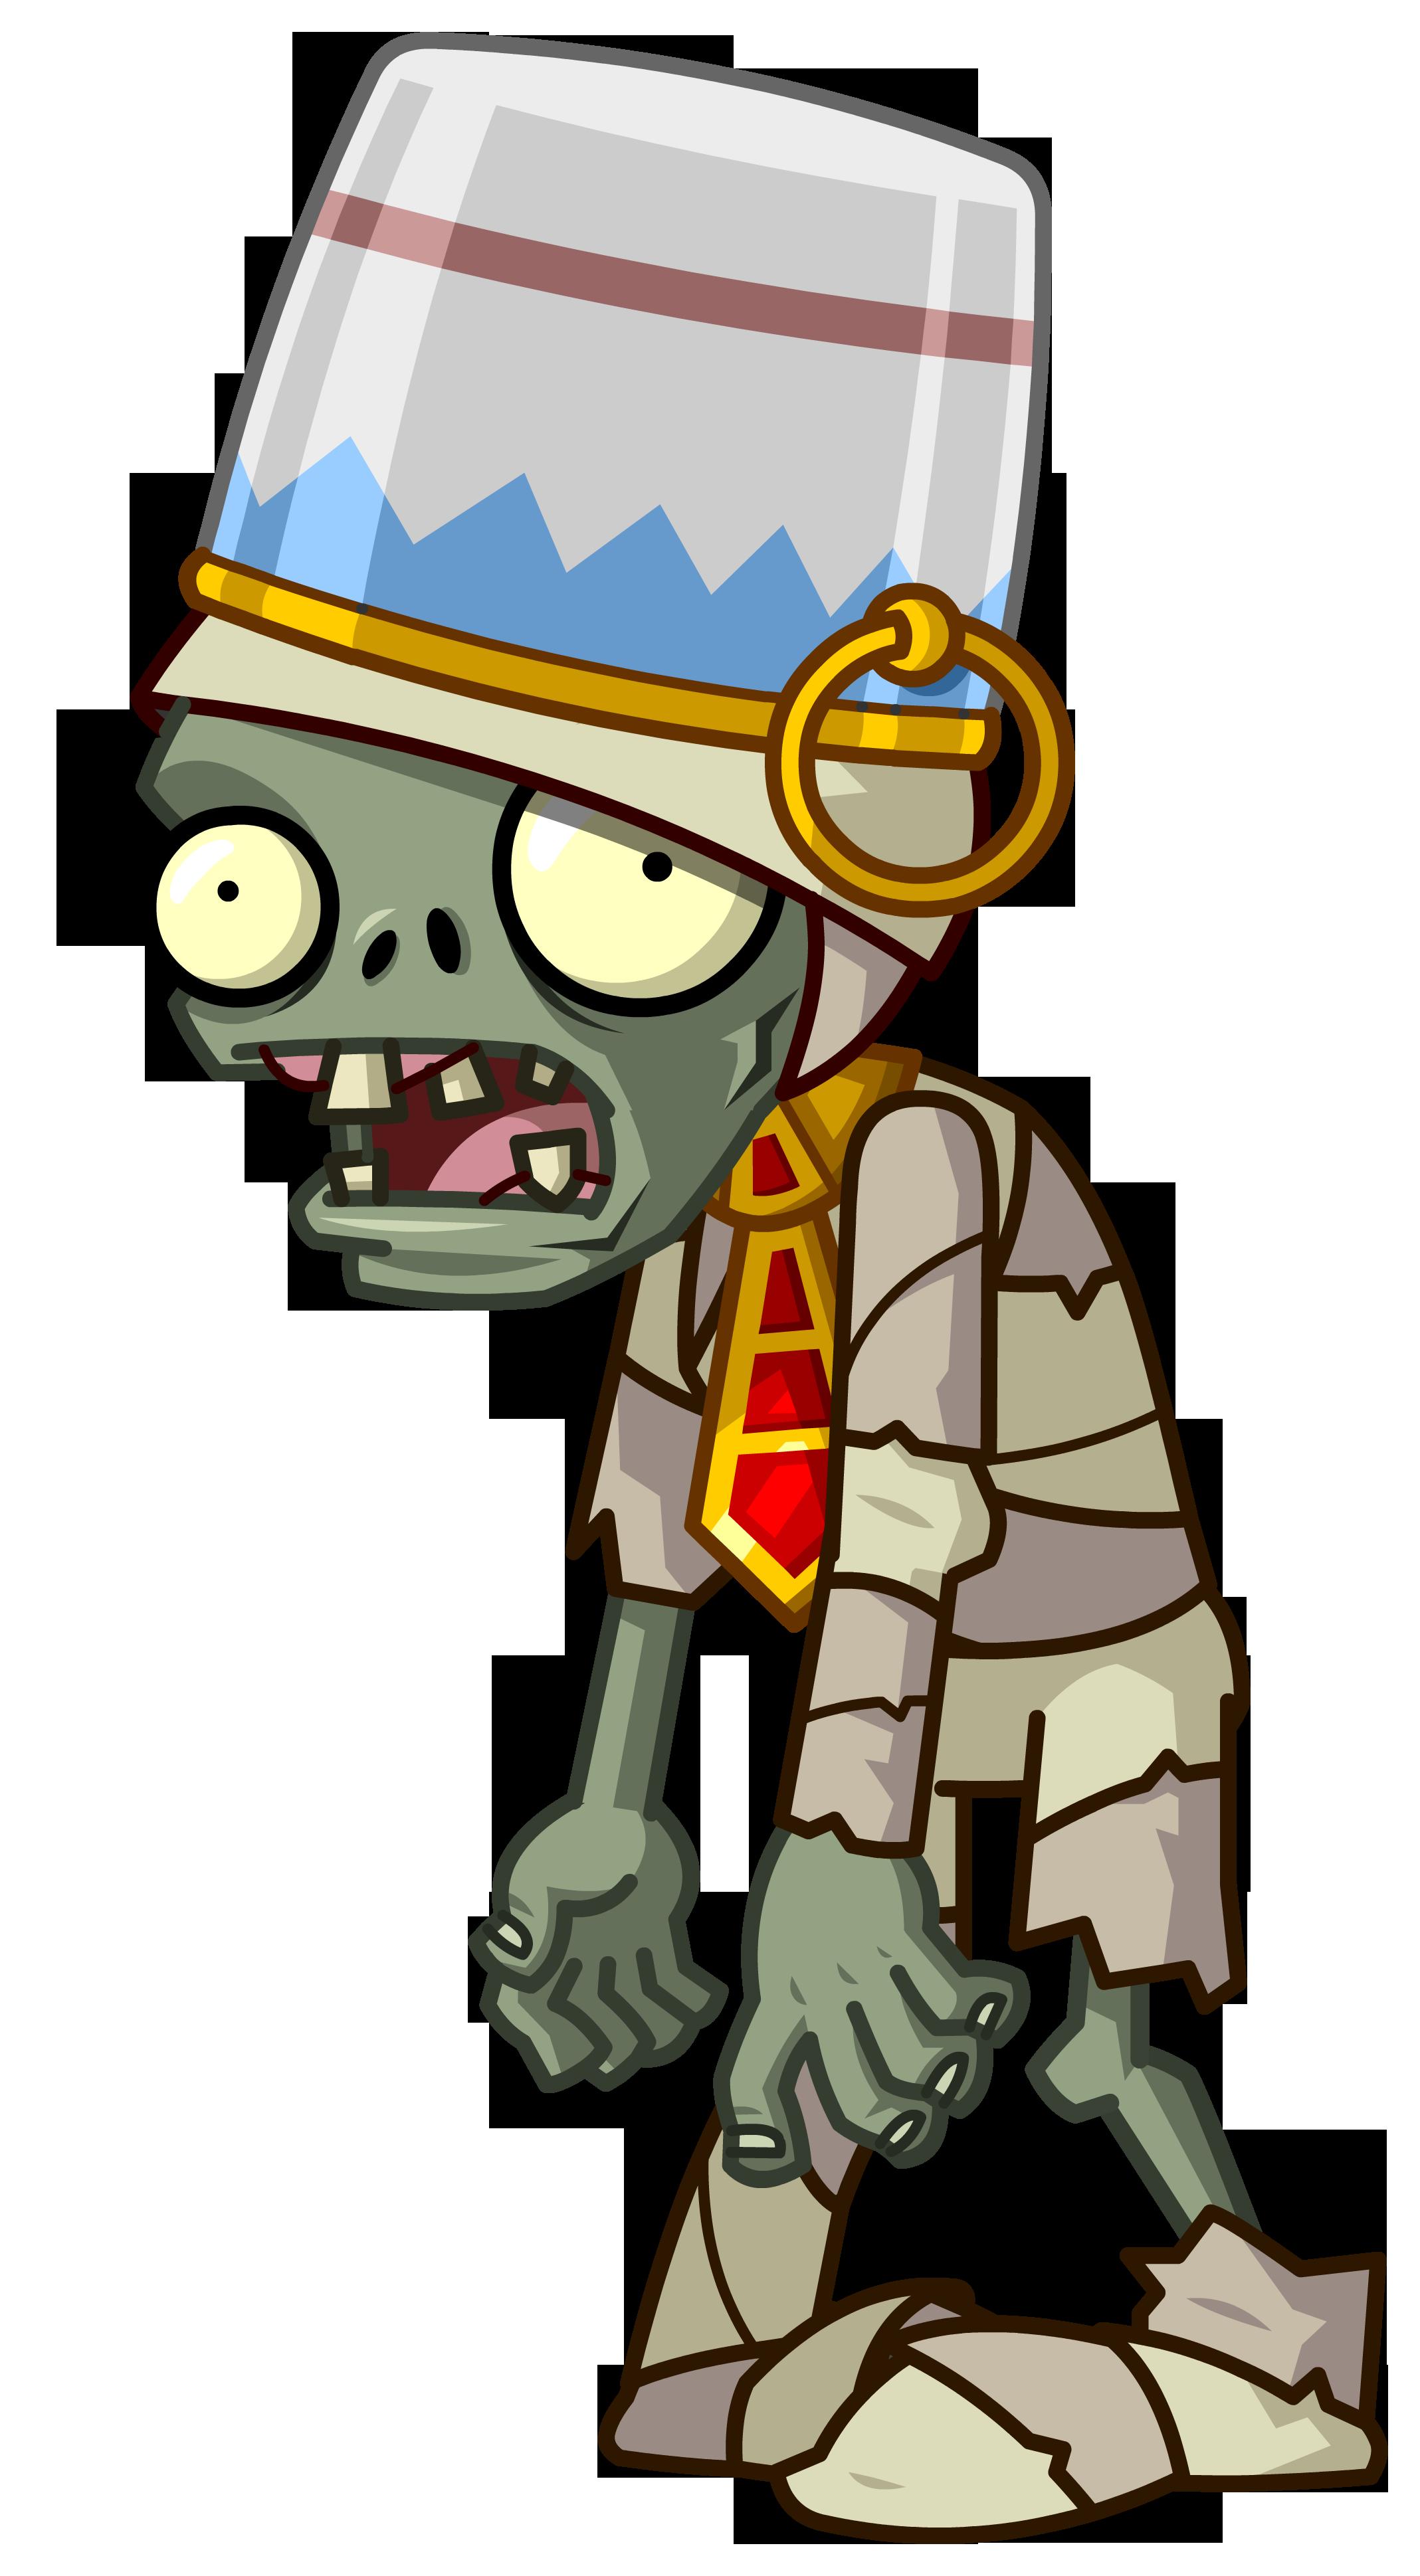 zombi momiacaracubo | zombi | Pinterest | Plants vs zombies, Zombie ... banner download